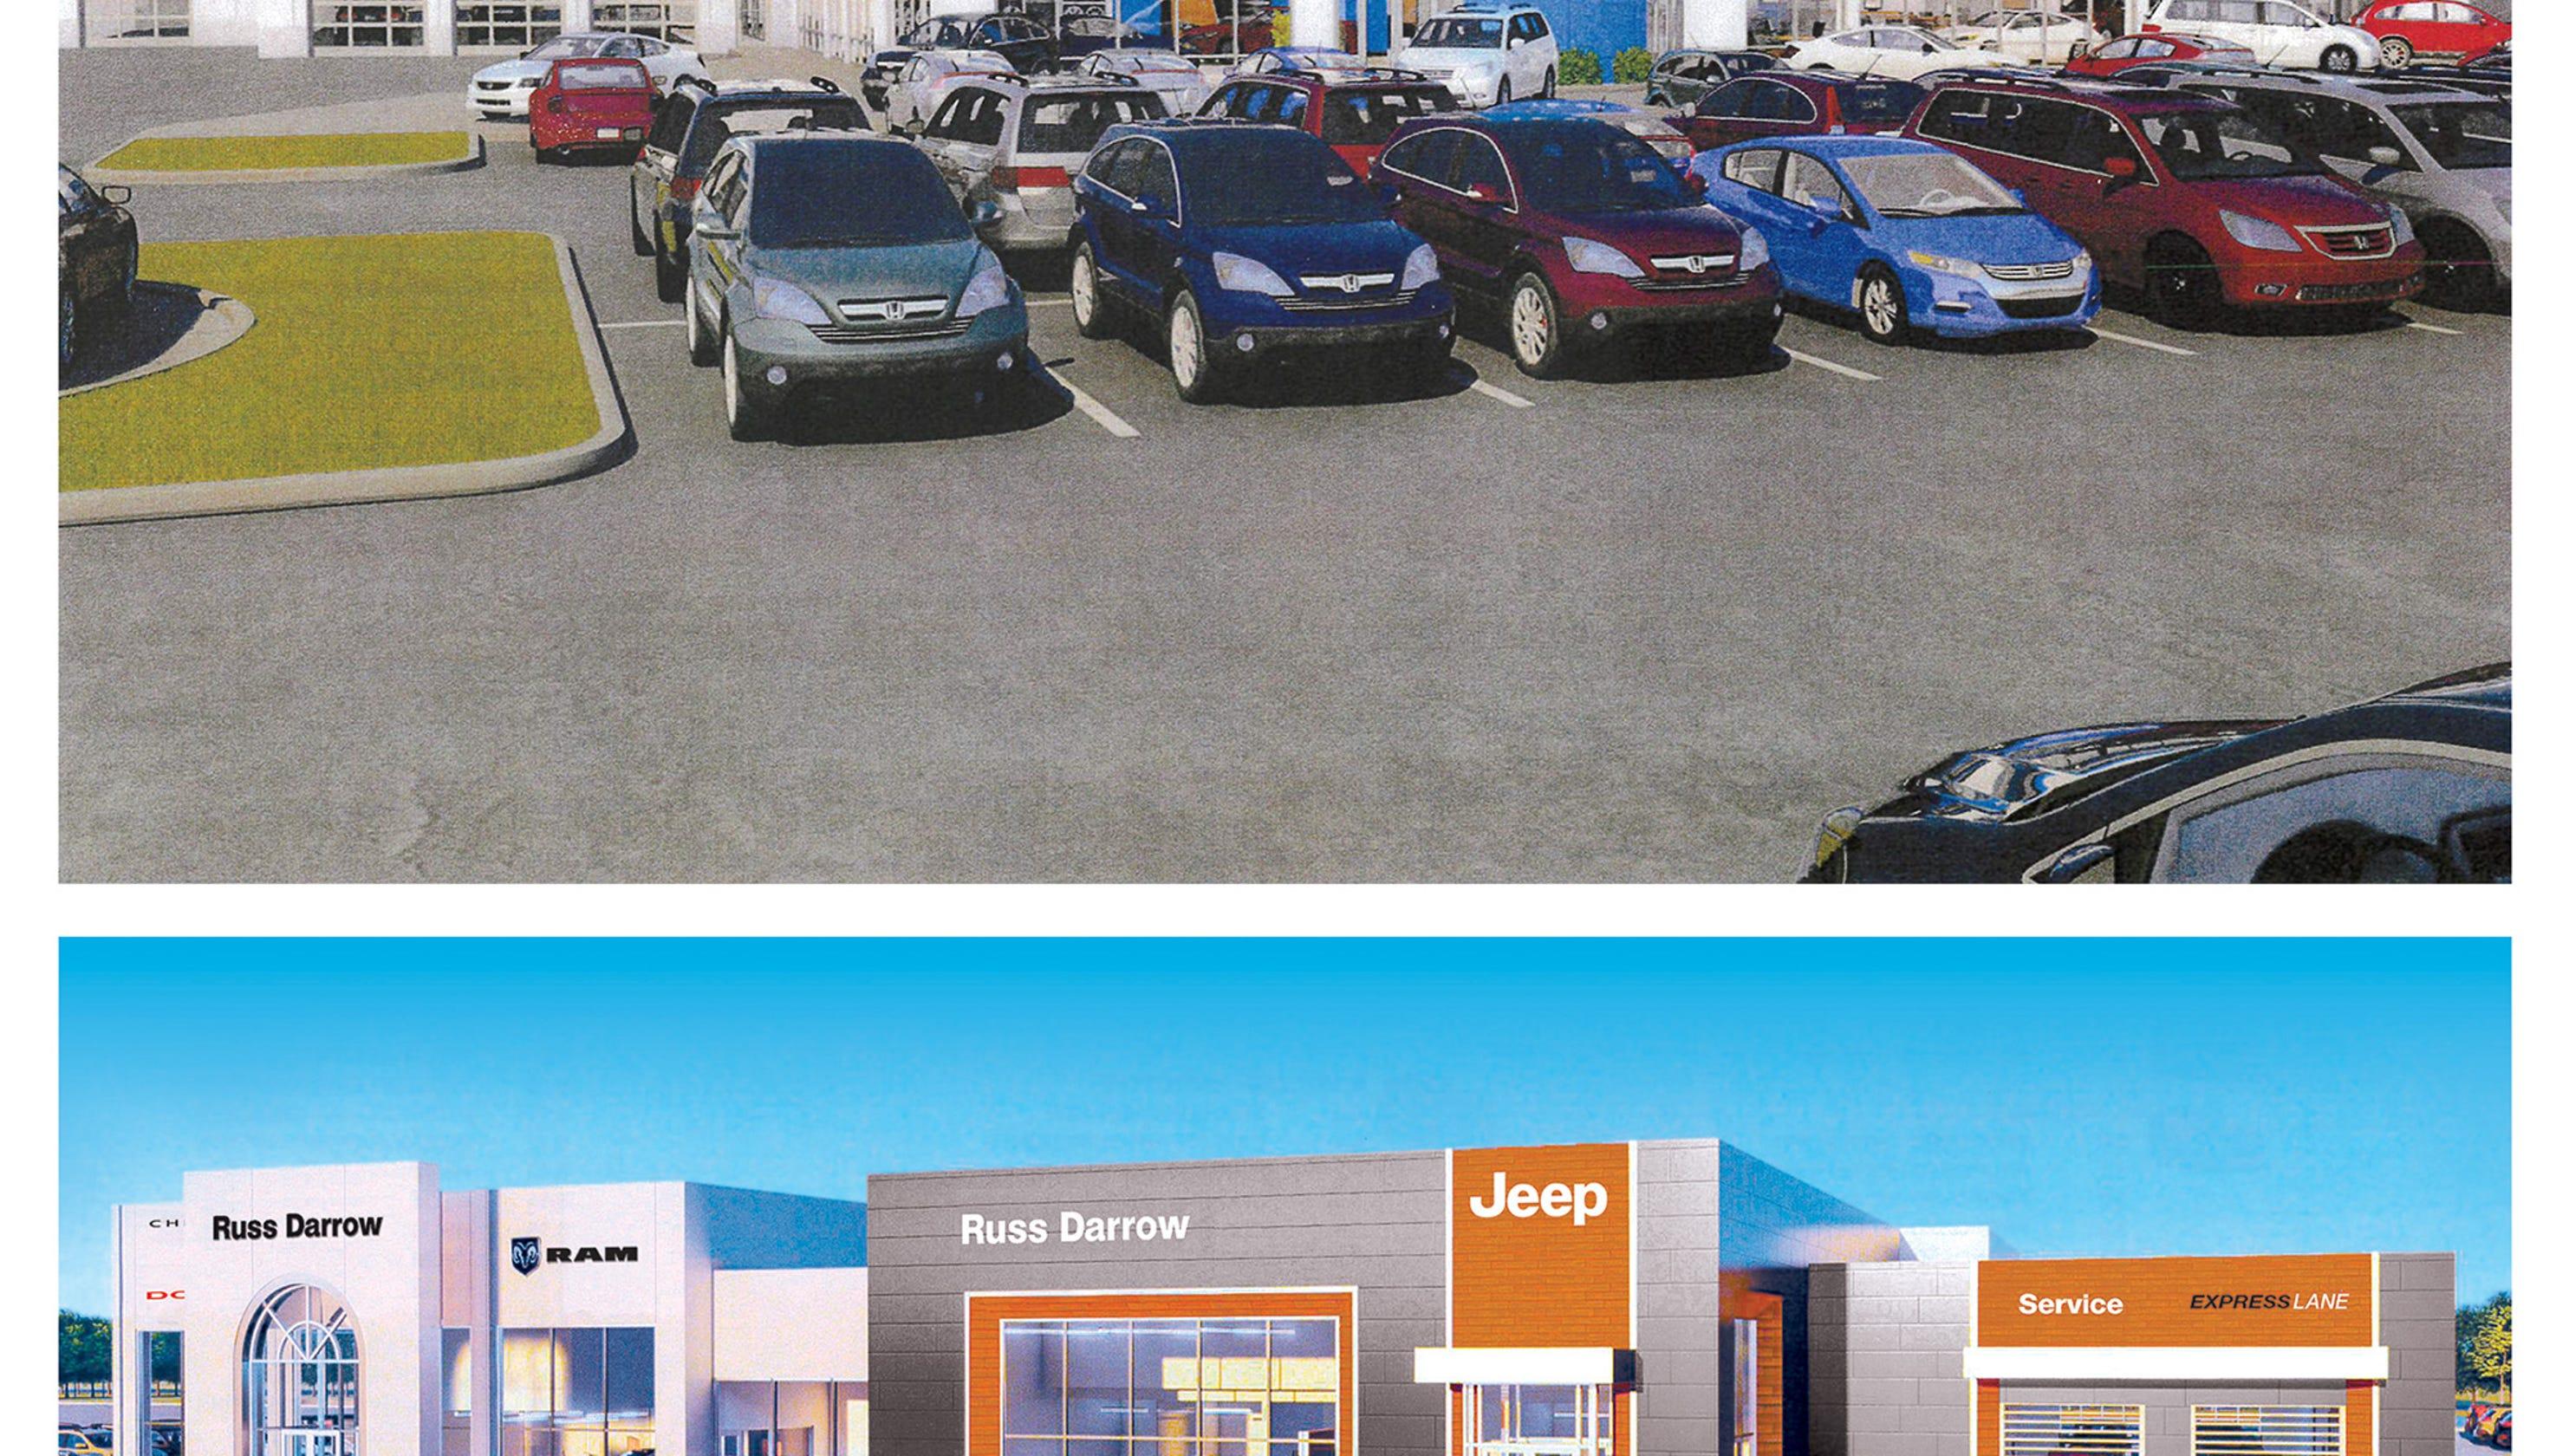 Russ Darrow Honda >> Milwaukee Metro Auto Mall Getting New Honda And Chrysler Dealerships